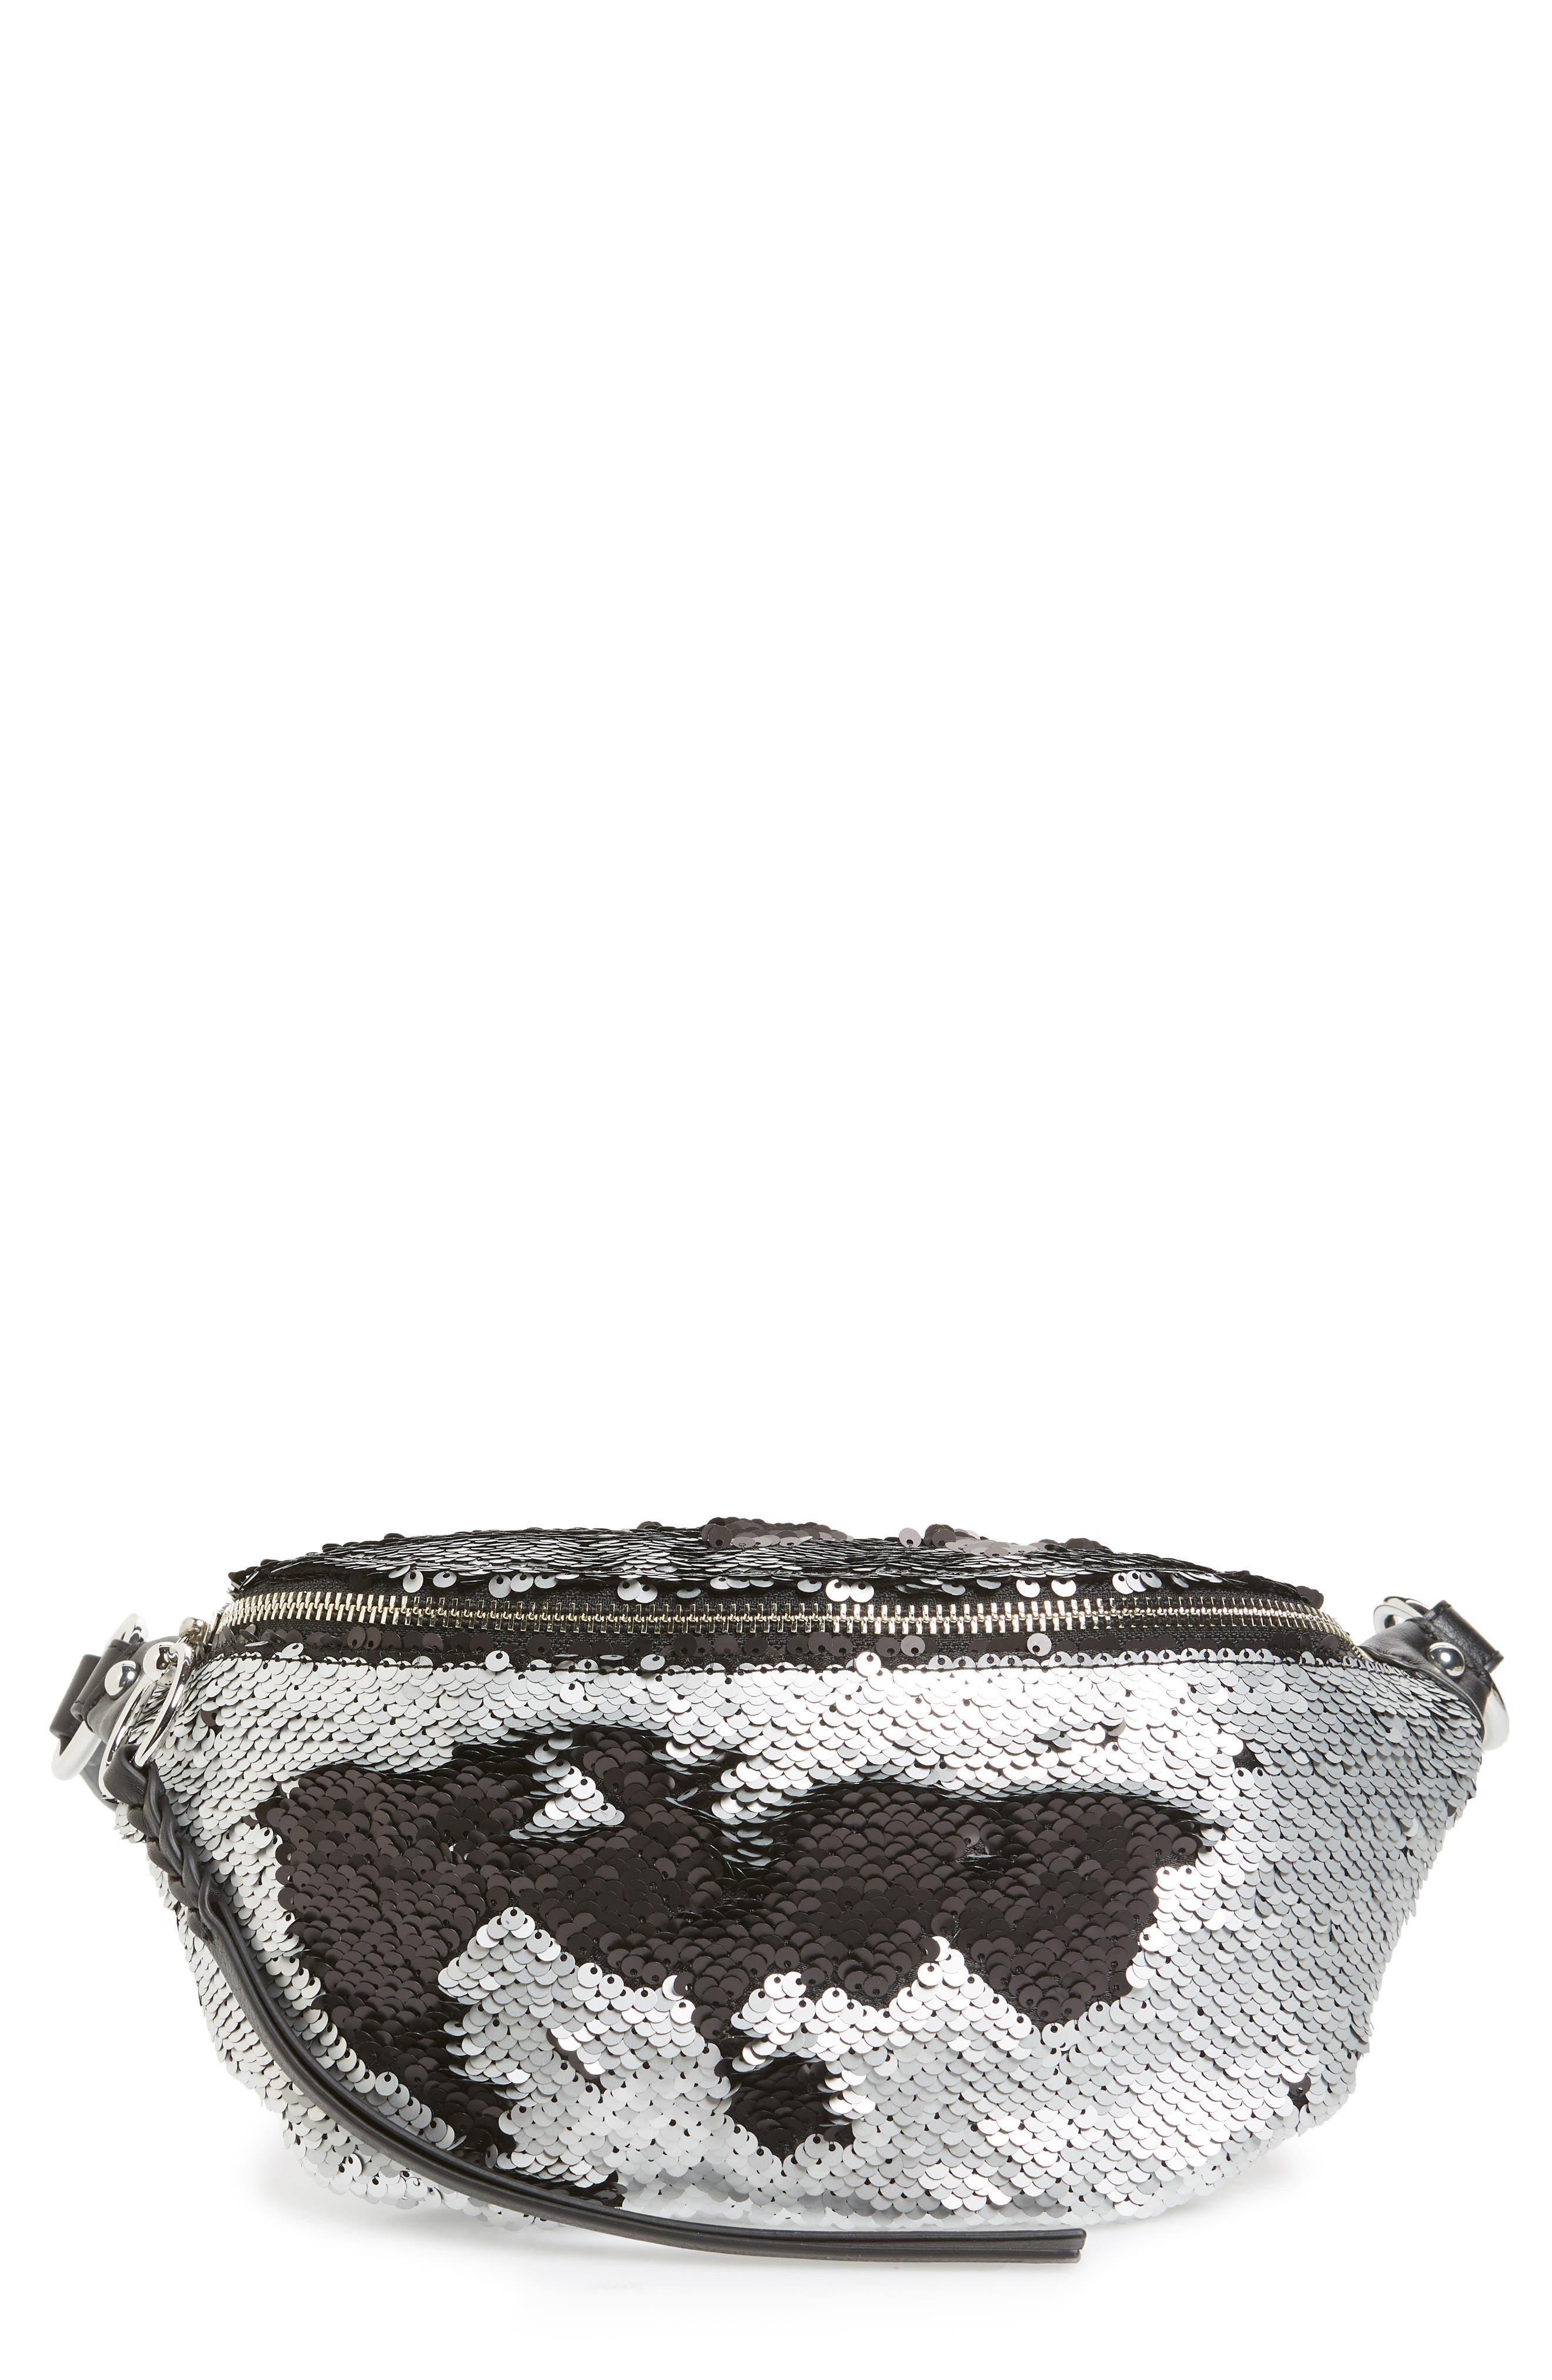 Sequin Belt Bag,                             Main thumbnail 1, color,                             SILVER